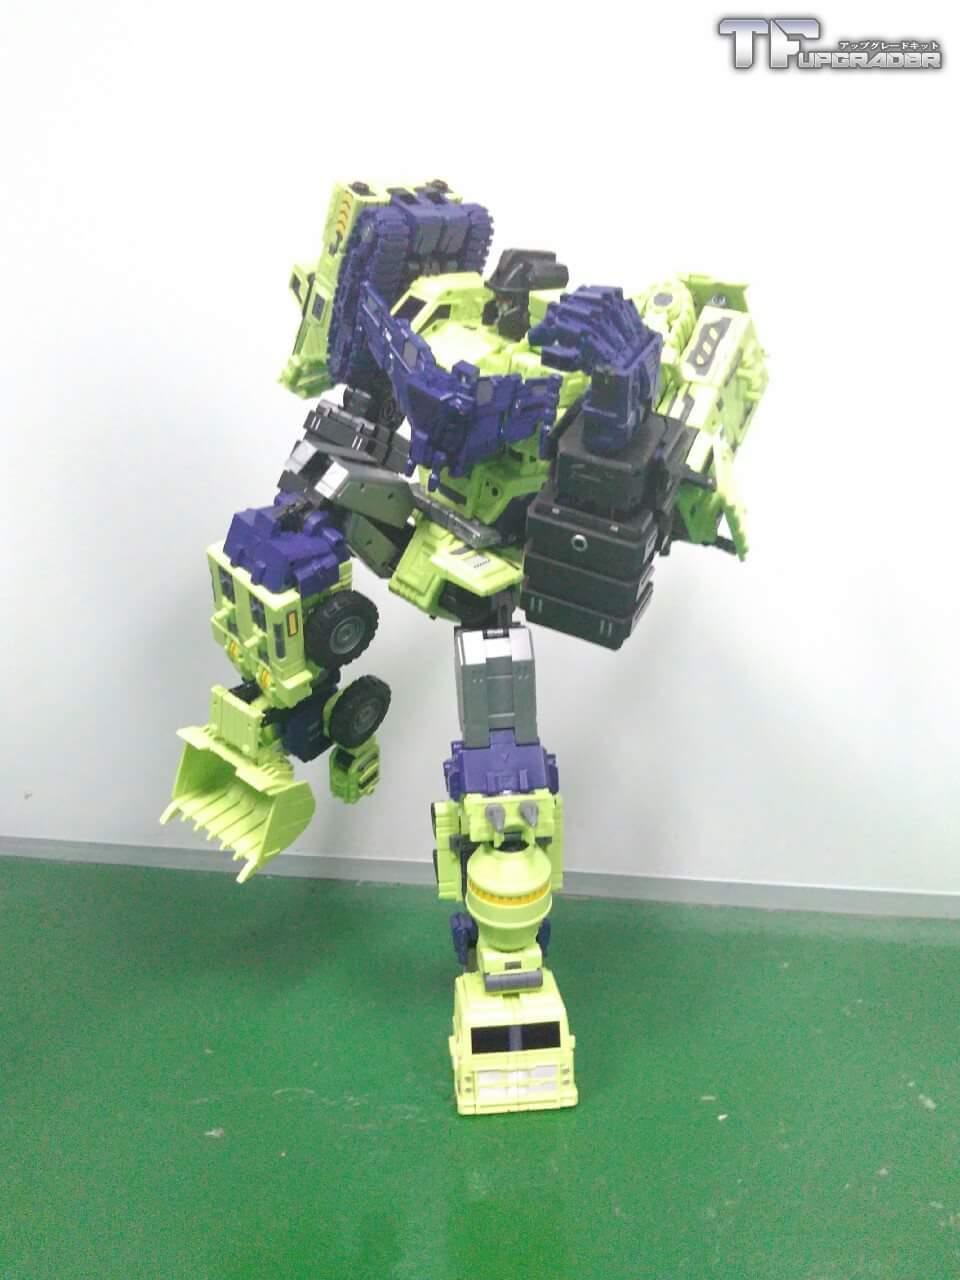 [Toyworld] Produit Tiers - Jouet TW-C Constructor aka Devastator/Dévastateur (Version vert G1 et jaune G2) - Page 4 2FBJZ7AX